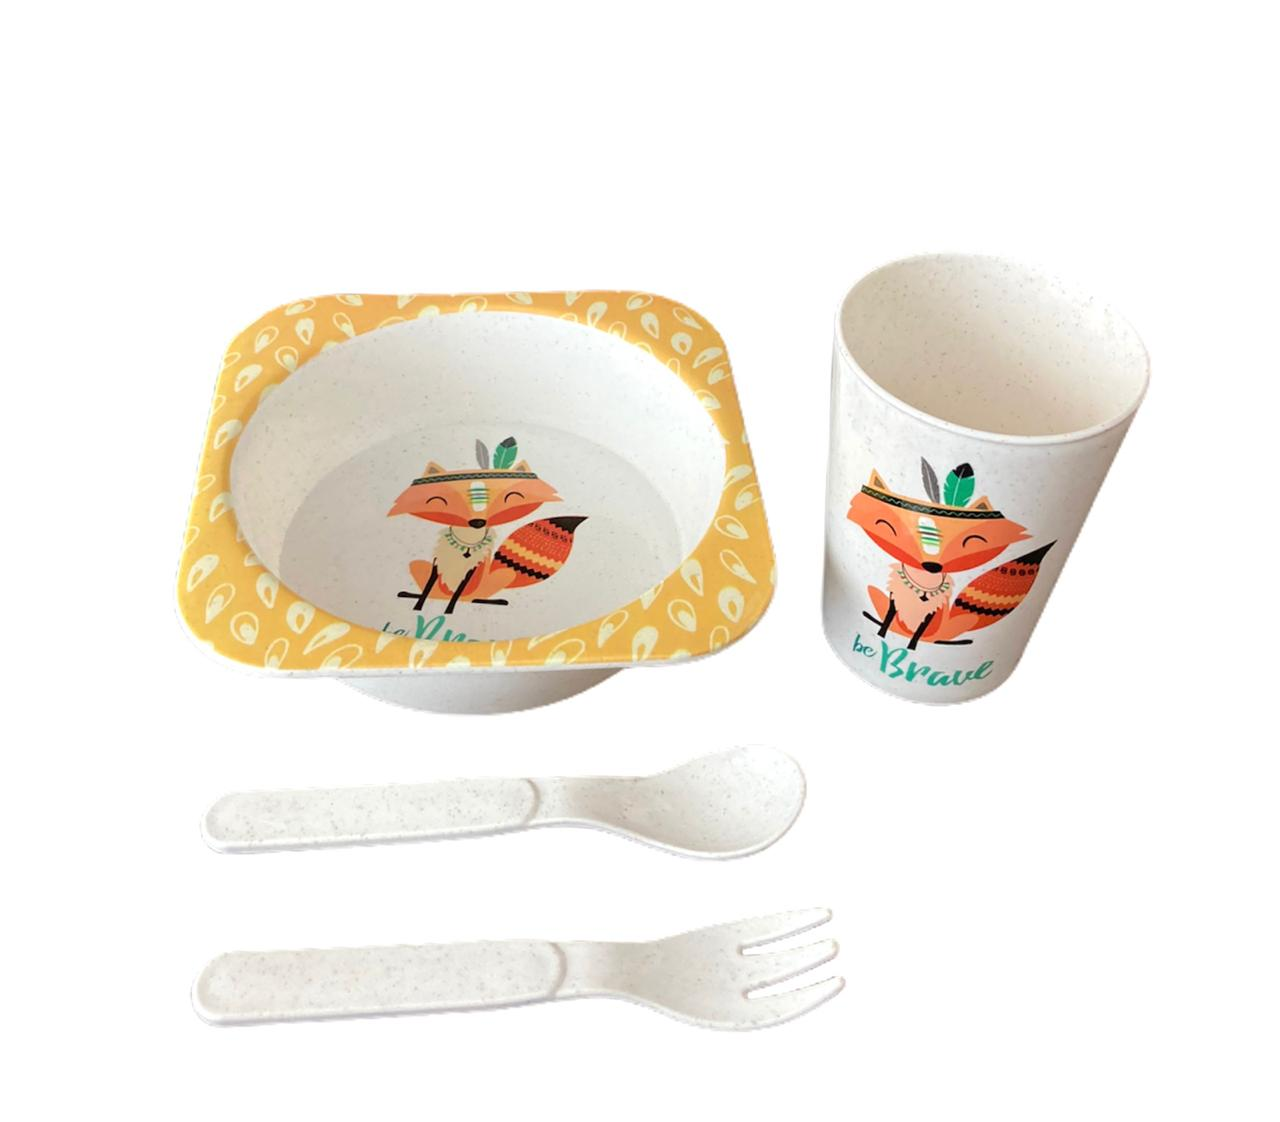 Kit Alimentação Raposa - 4 peças